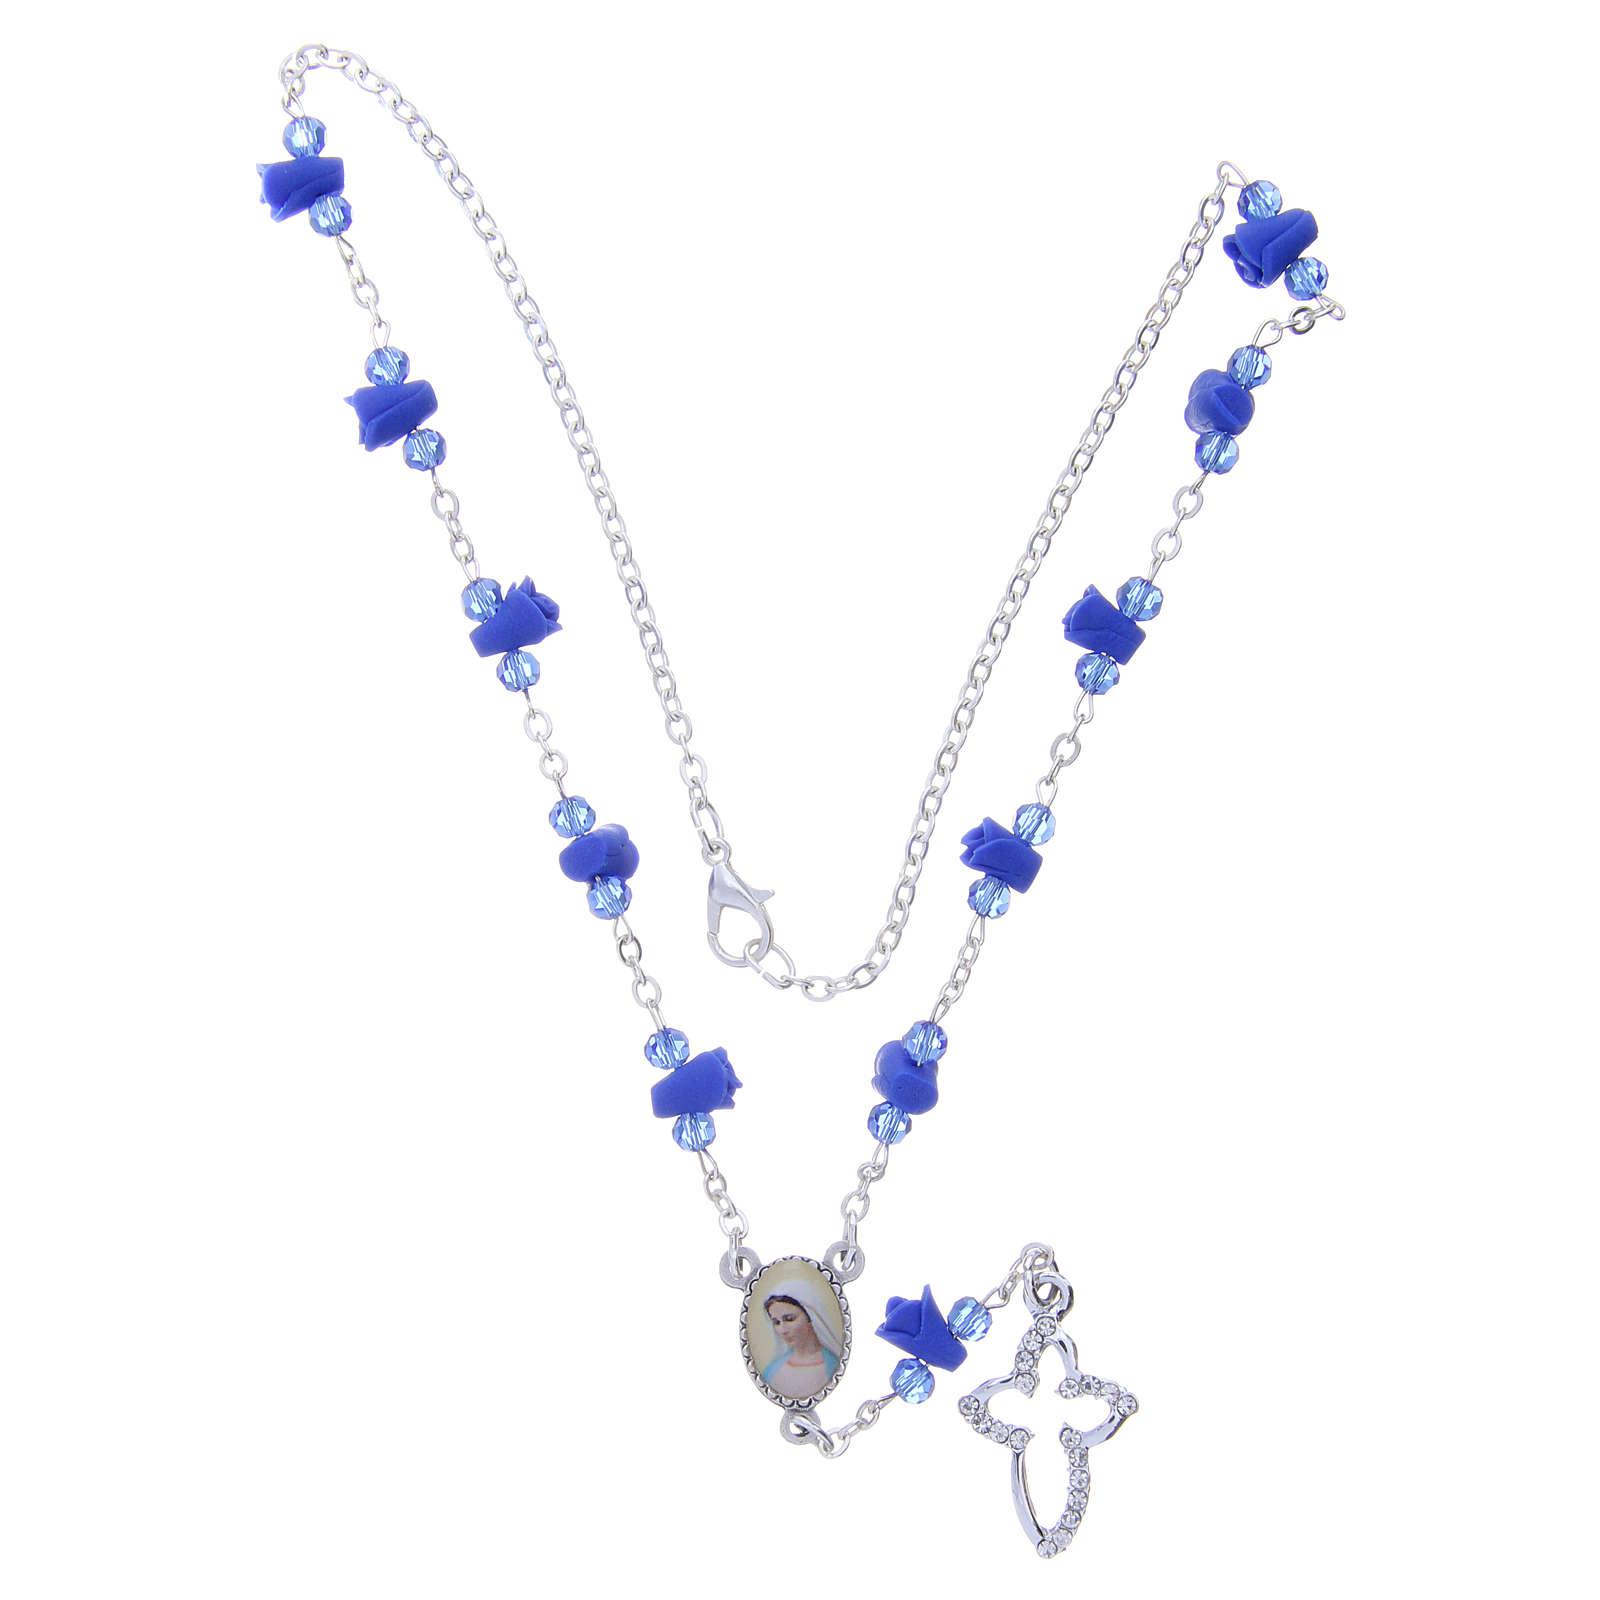 Collana rosario Medjugorje rose blu ceramica icona Madonna 4